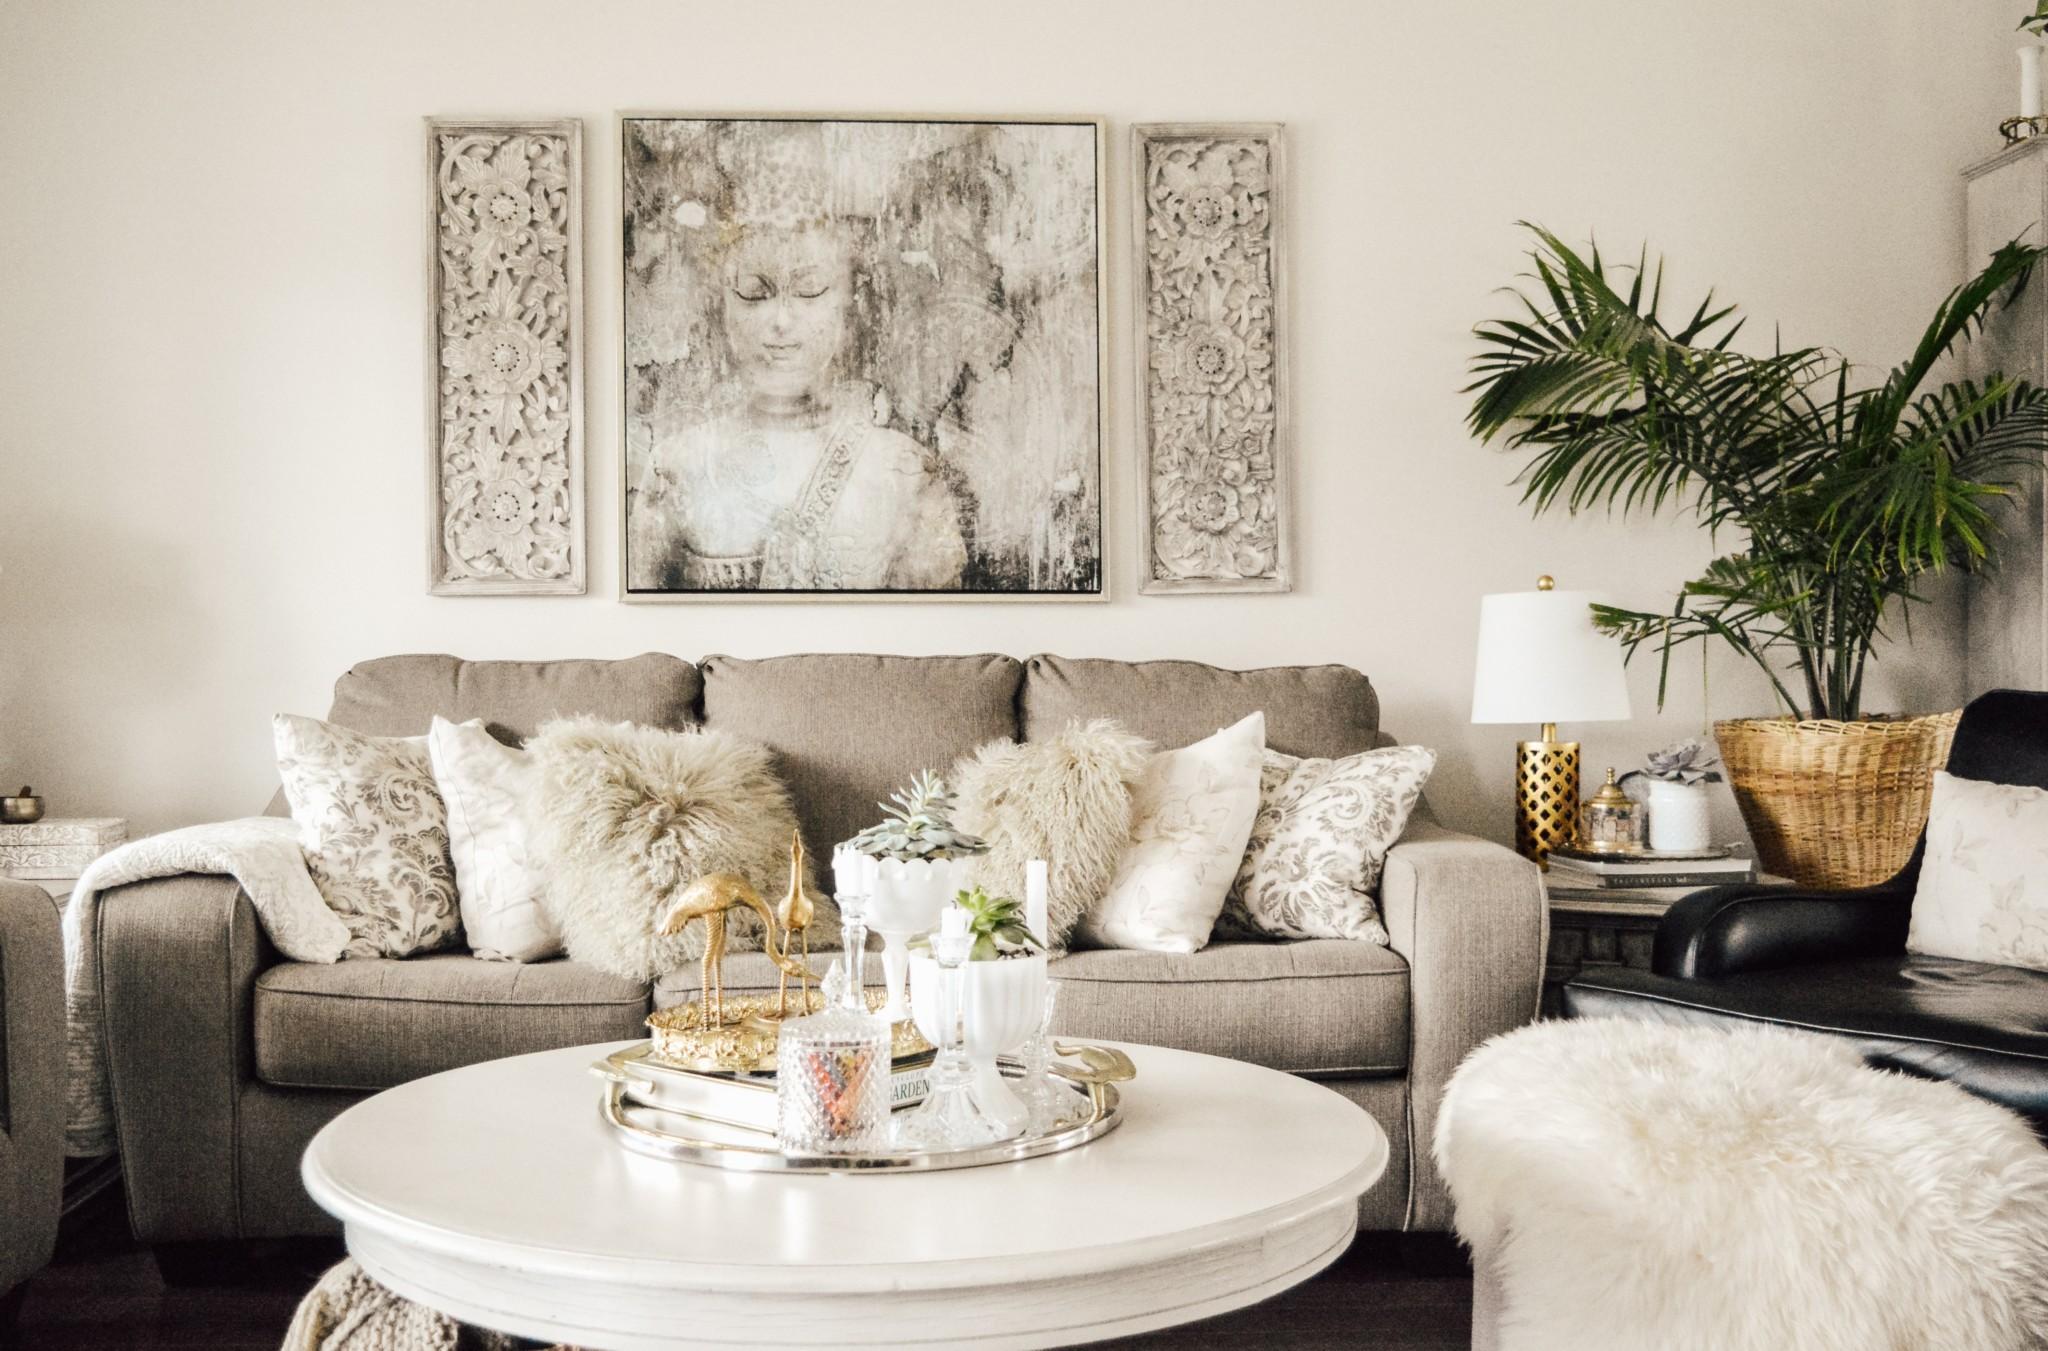 Feng Shui Design Elements for the Living Room + Family Room - Feng